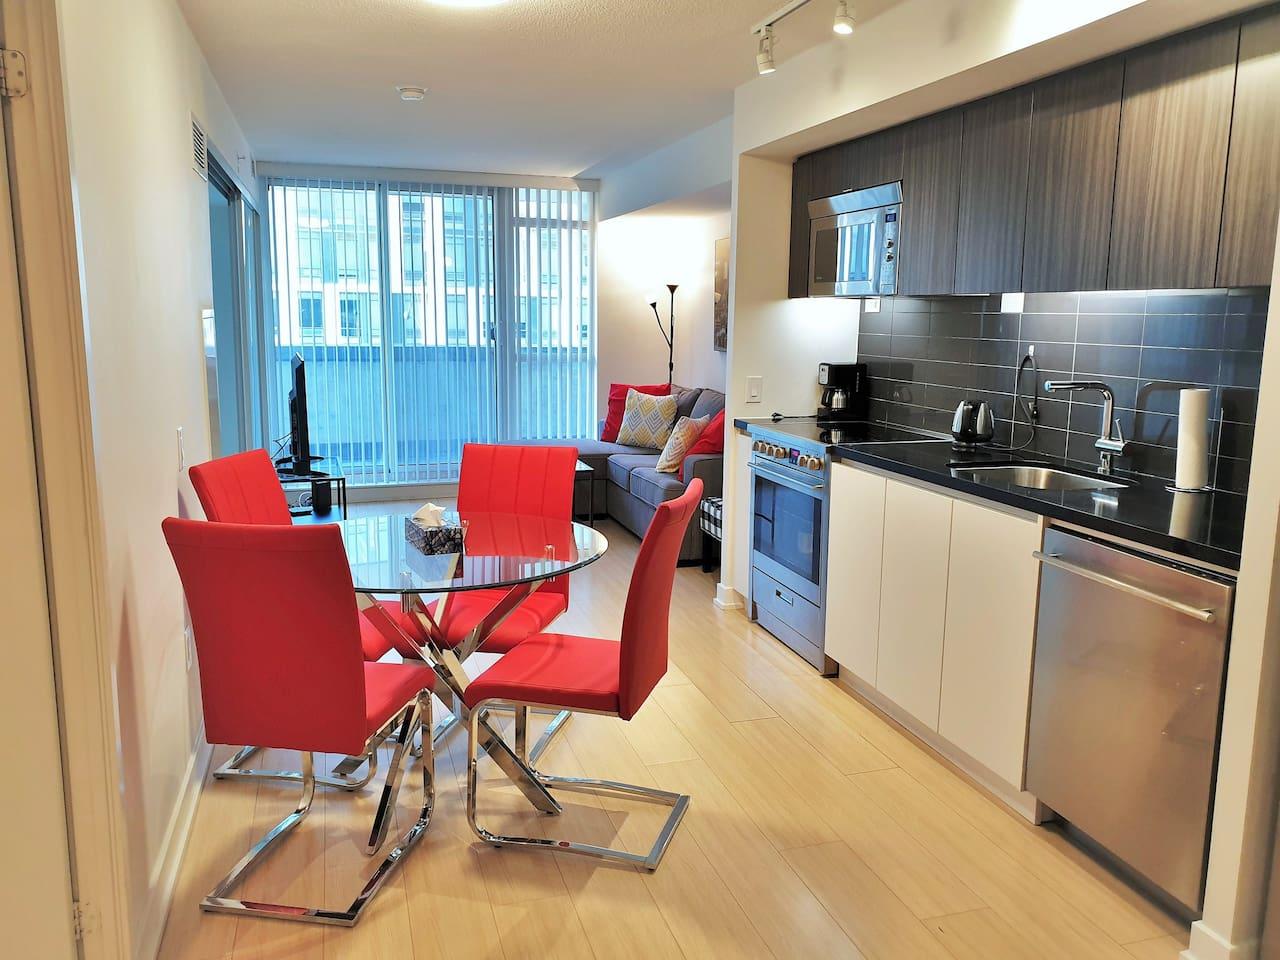 Dining Room / Kitchen / Living Room